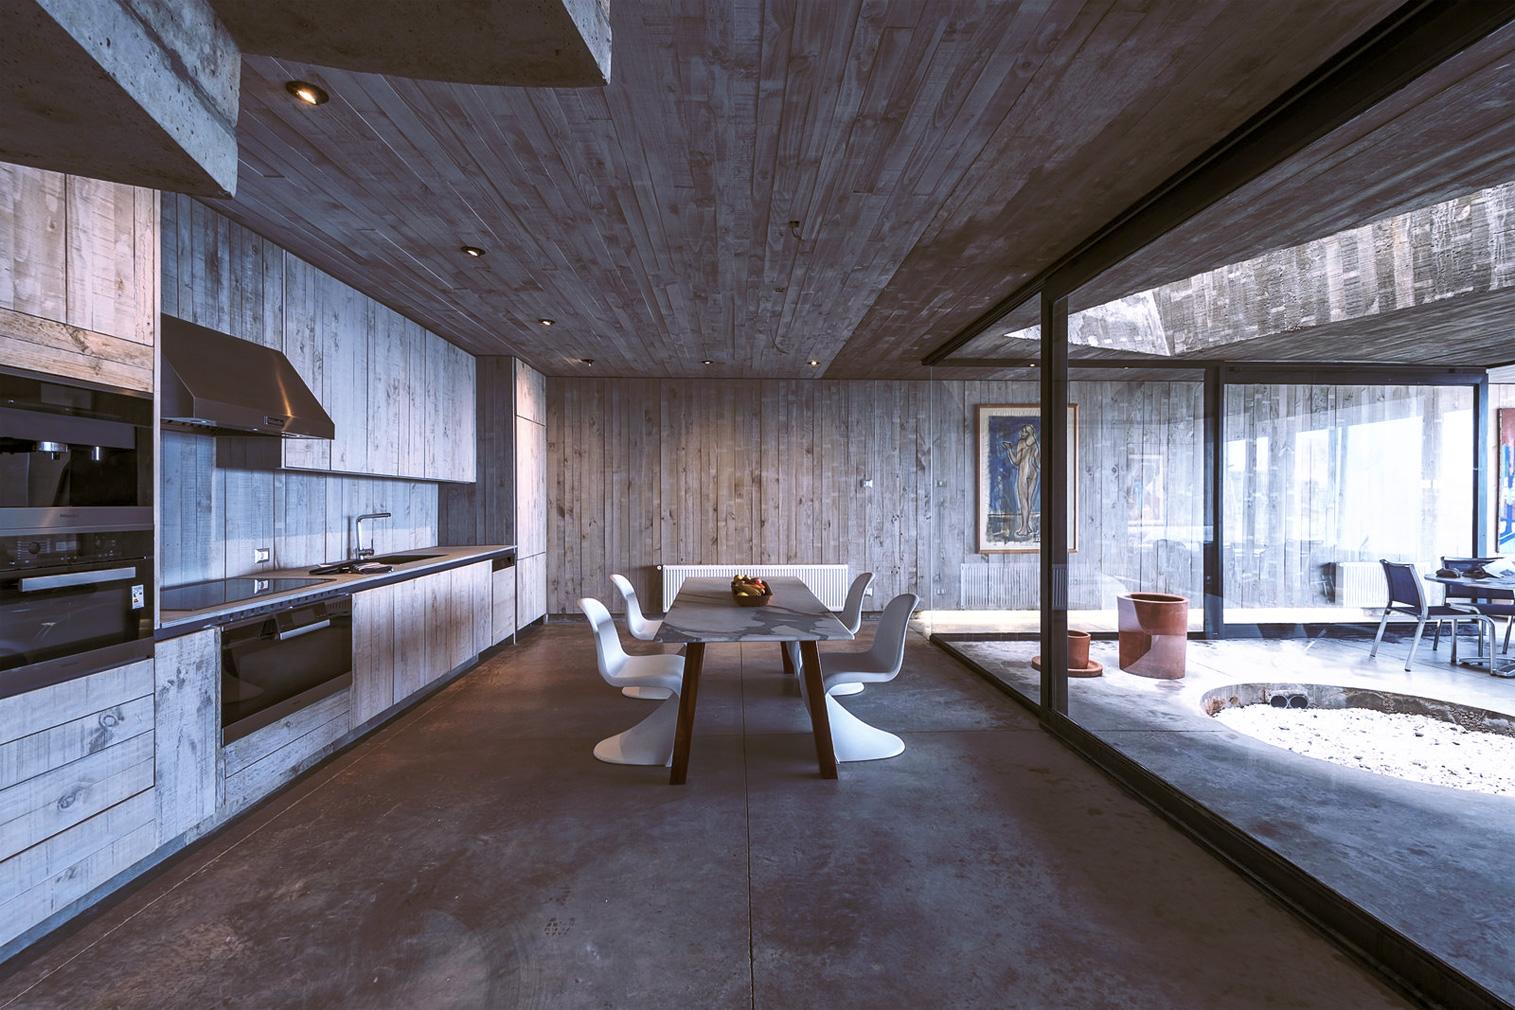 Property of the week: a 'primitive' Chilean home by Pritzker Prize-winner Alejandro Aravena